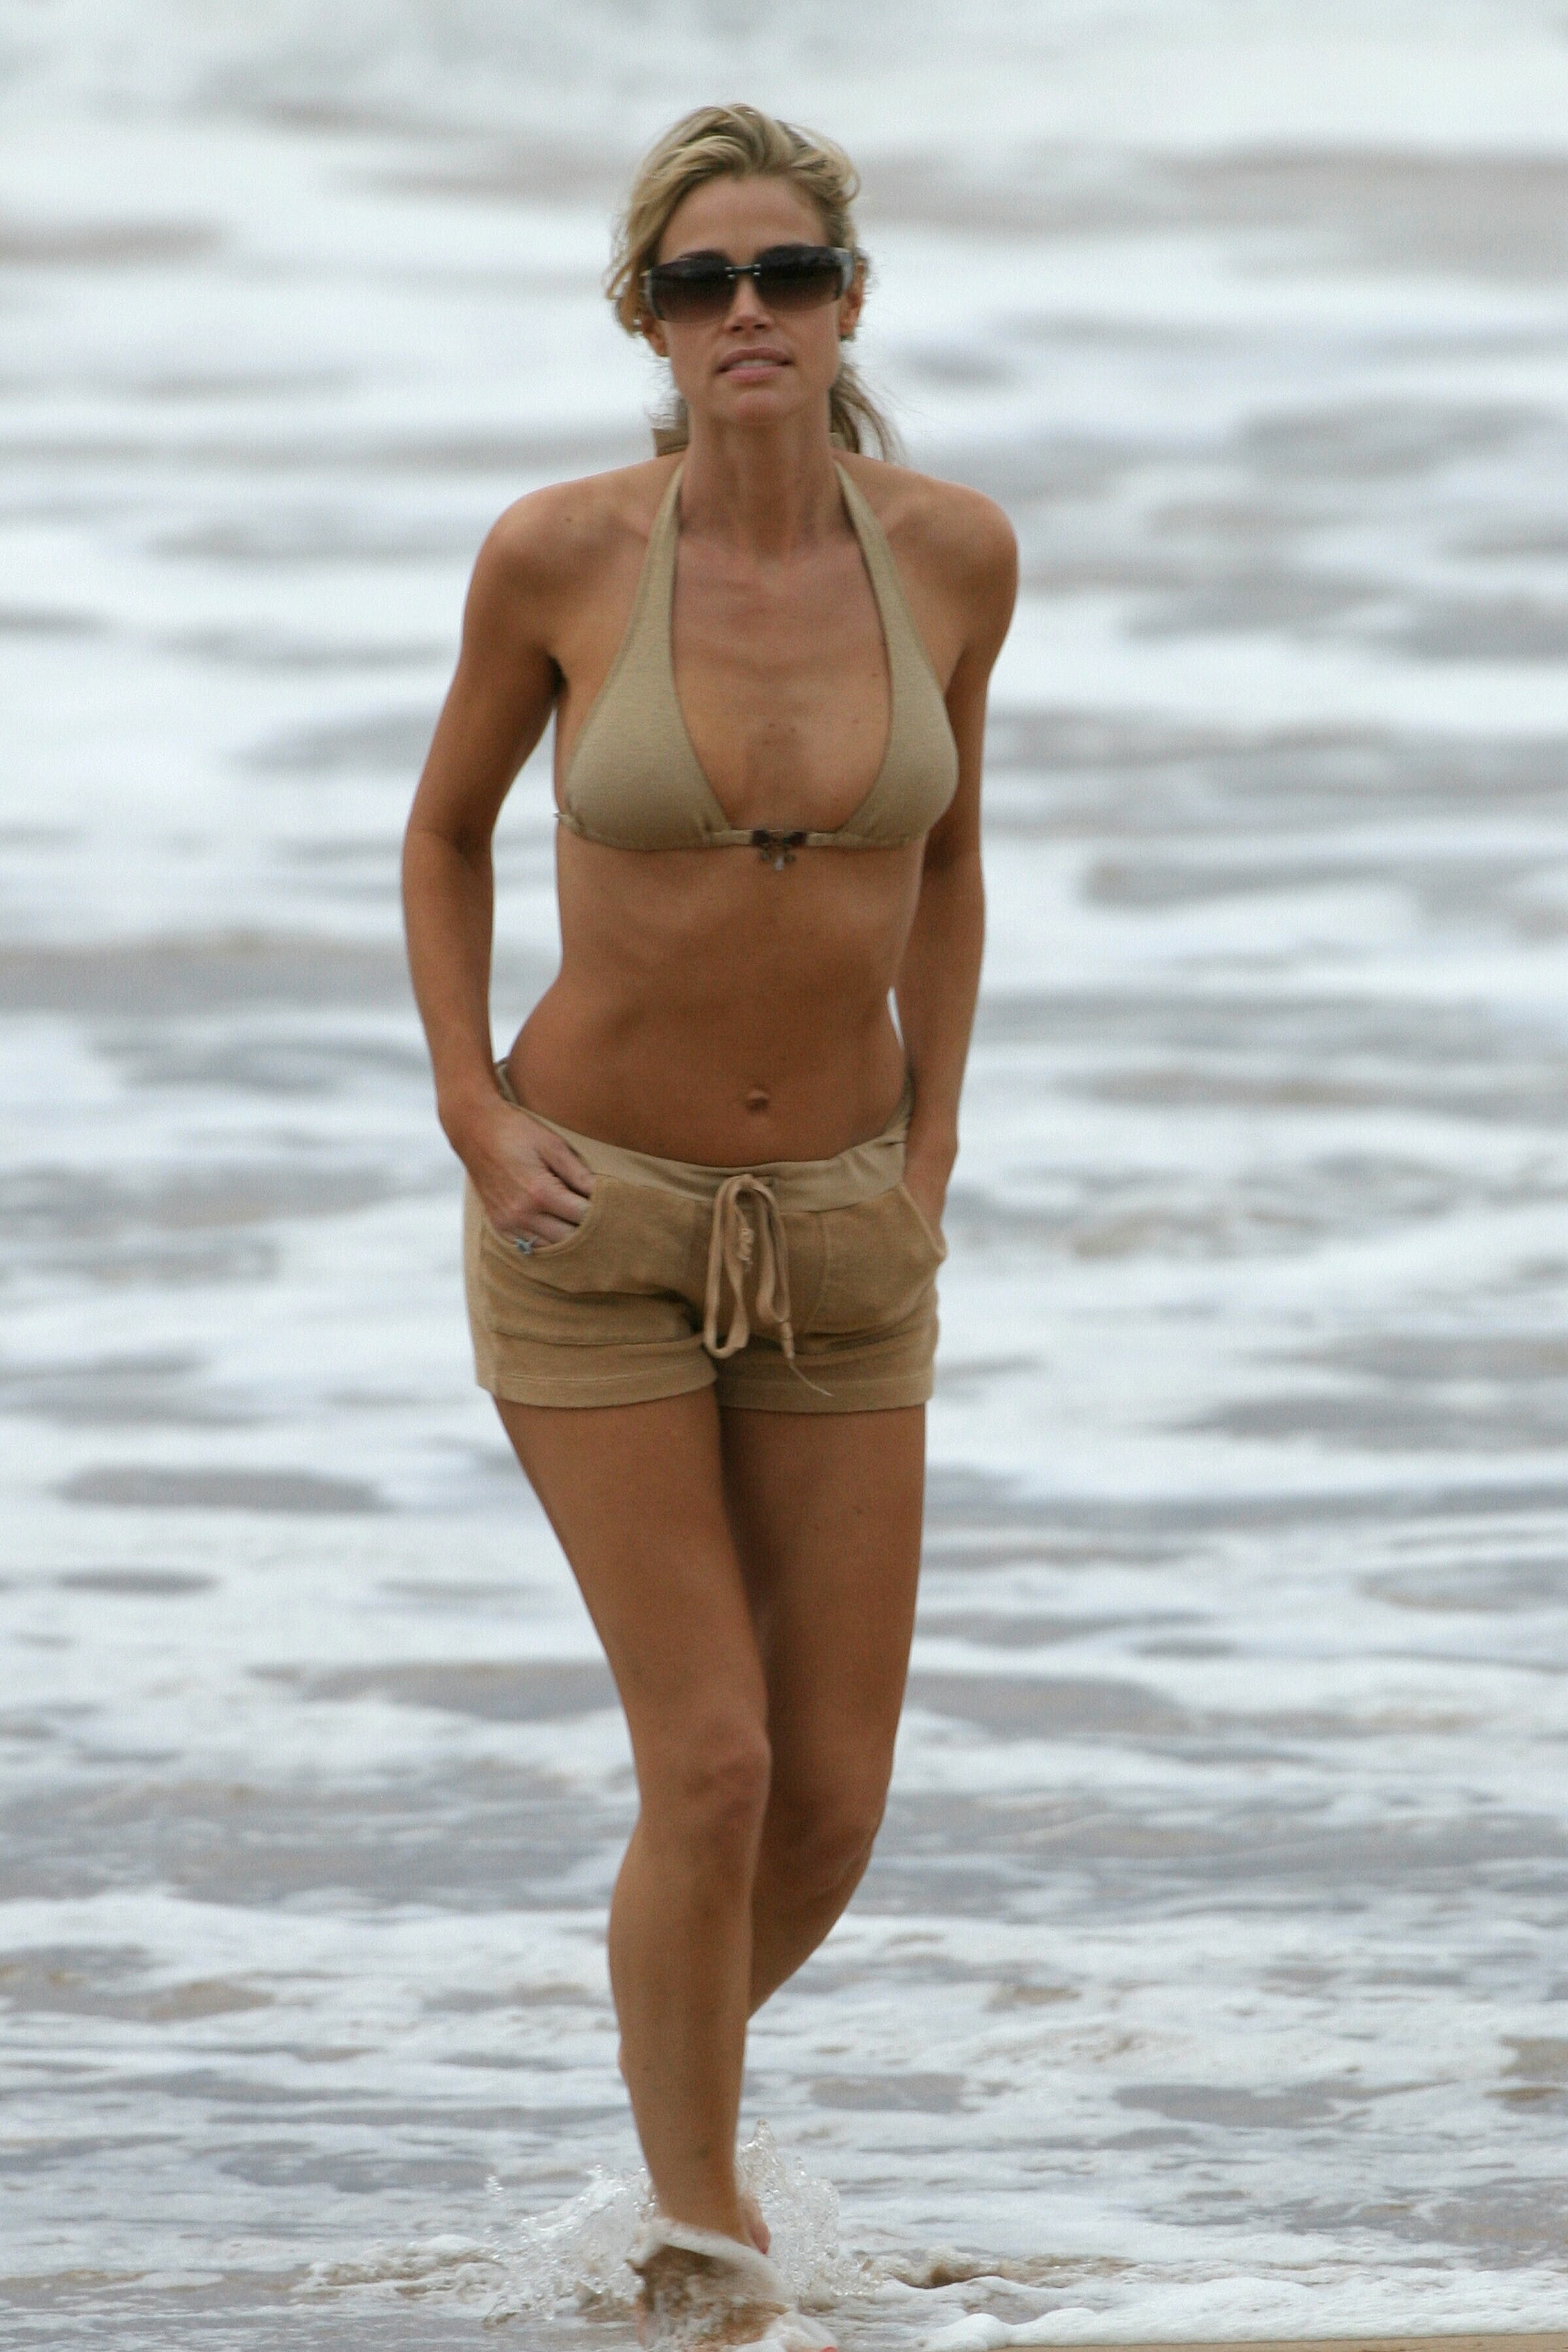 63536_MaD_HQCB.net_Denise_Richards_bikini_03_122_263lo.jpg